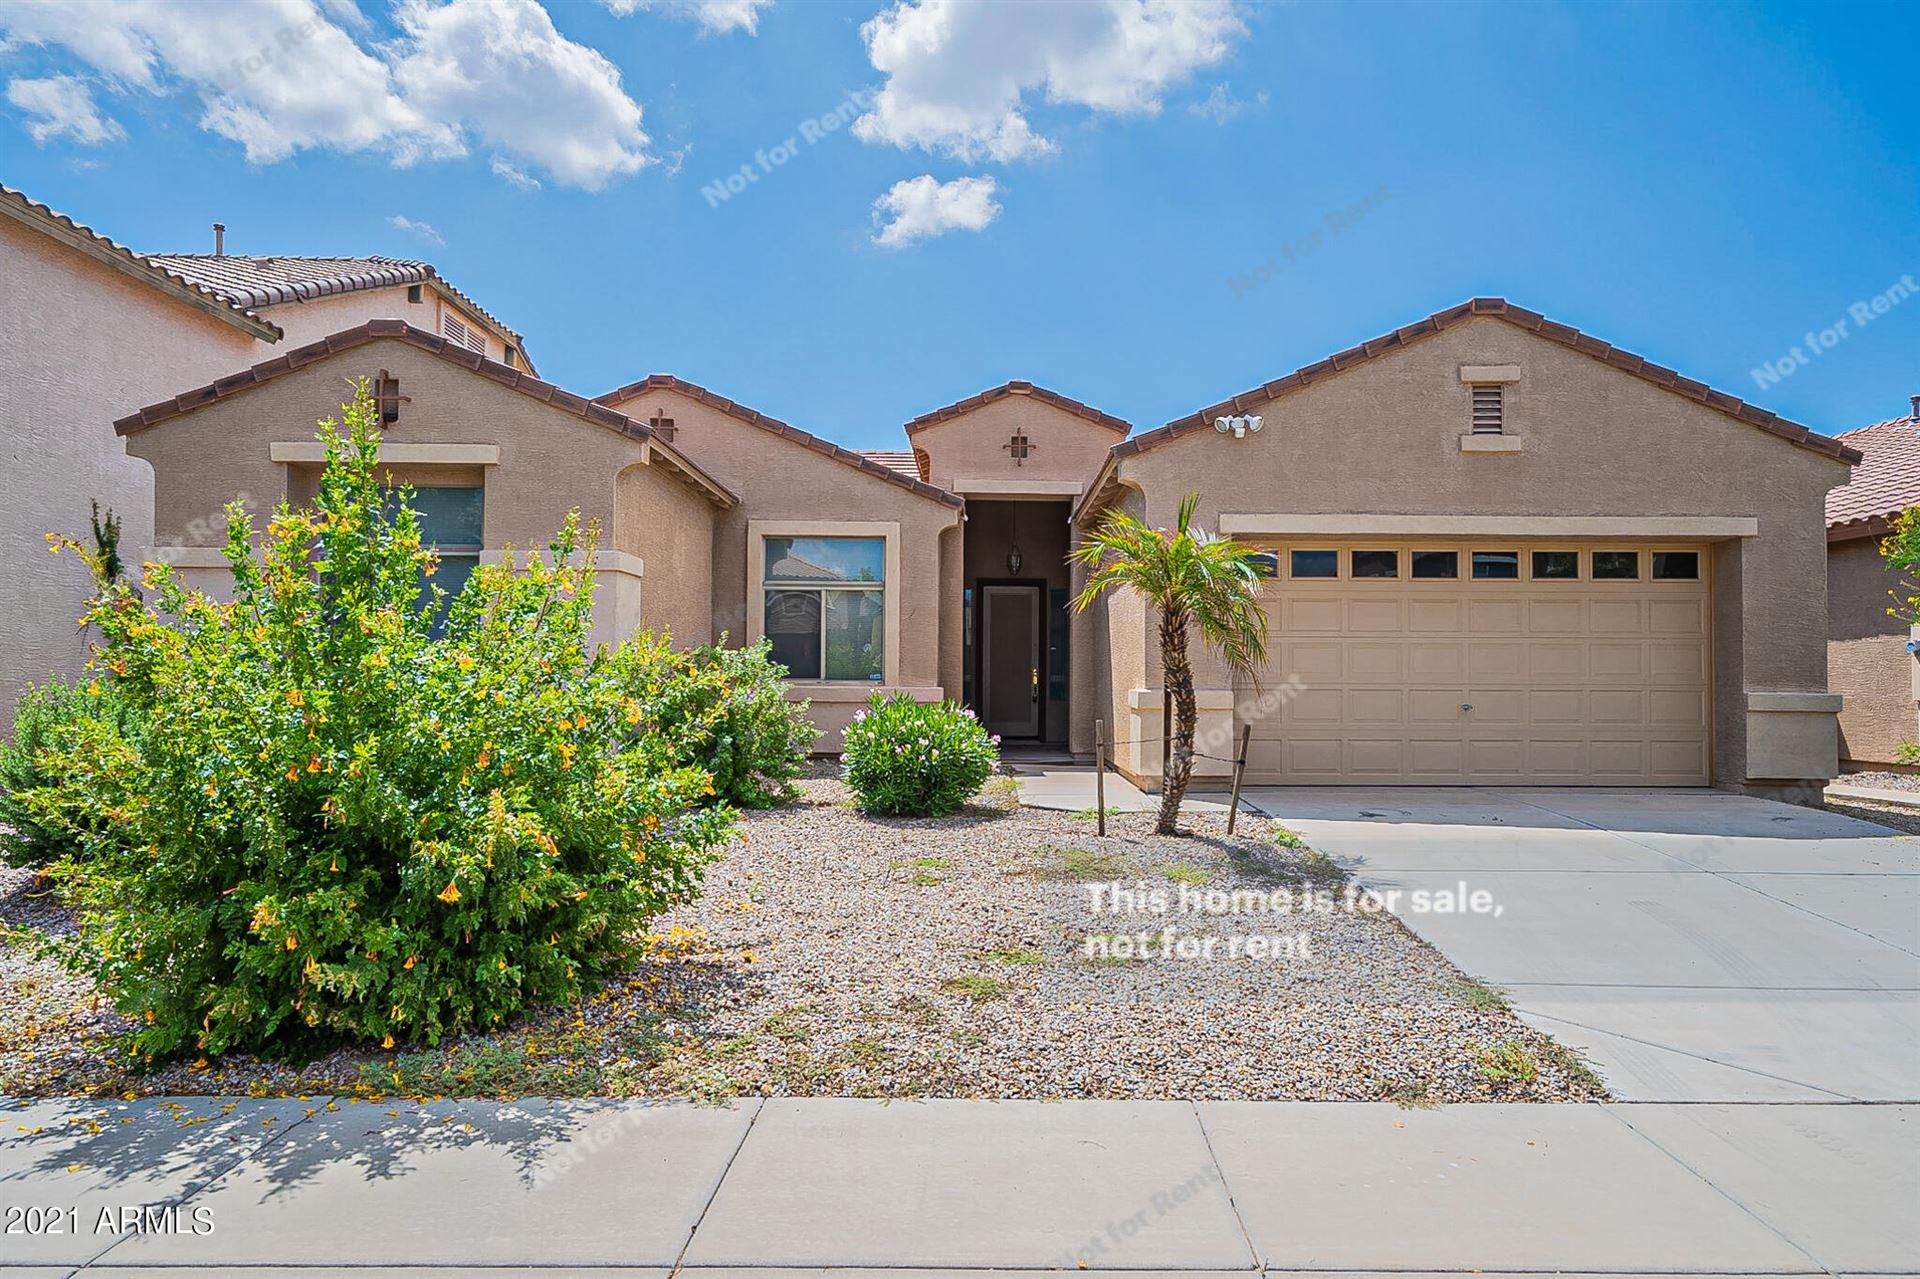 Photo for 41123 W NOVAK Lane, Maricopa, AZ 85138 (MLS # 6290795)